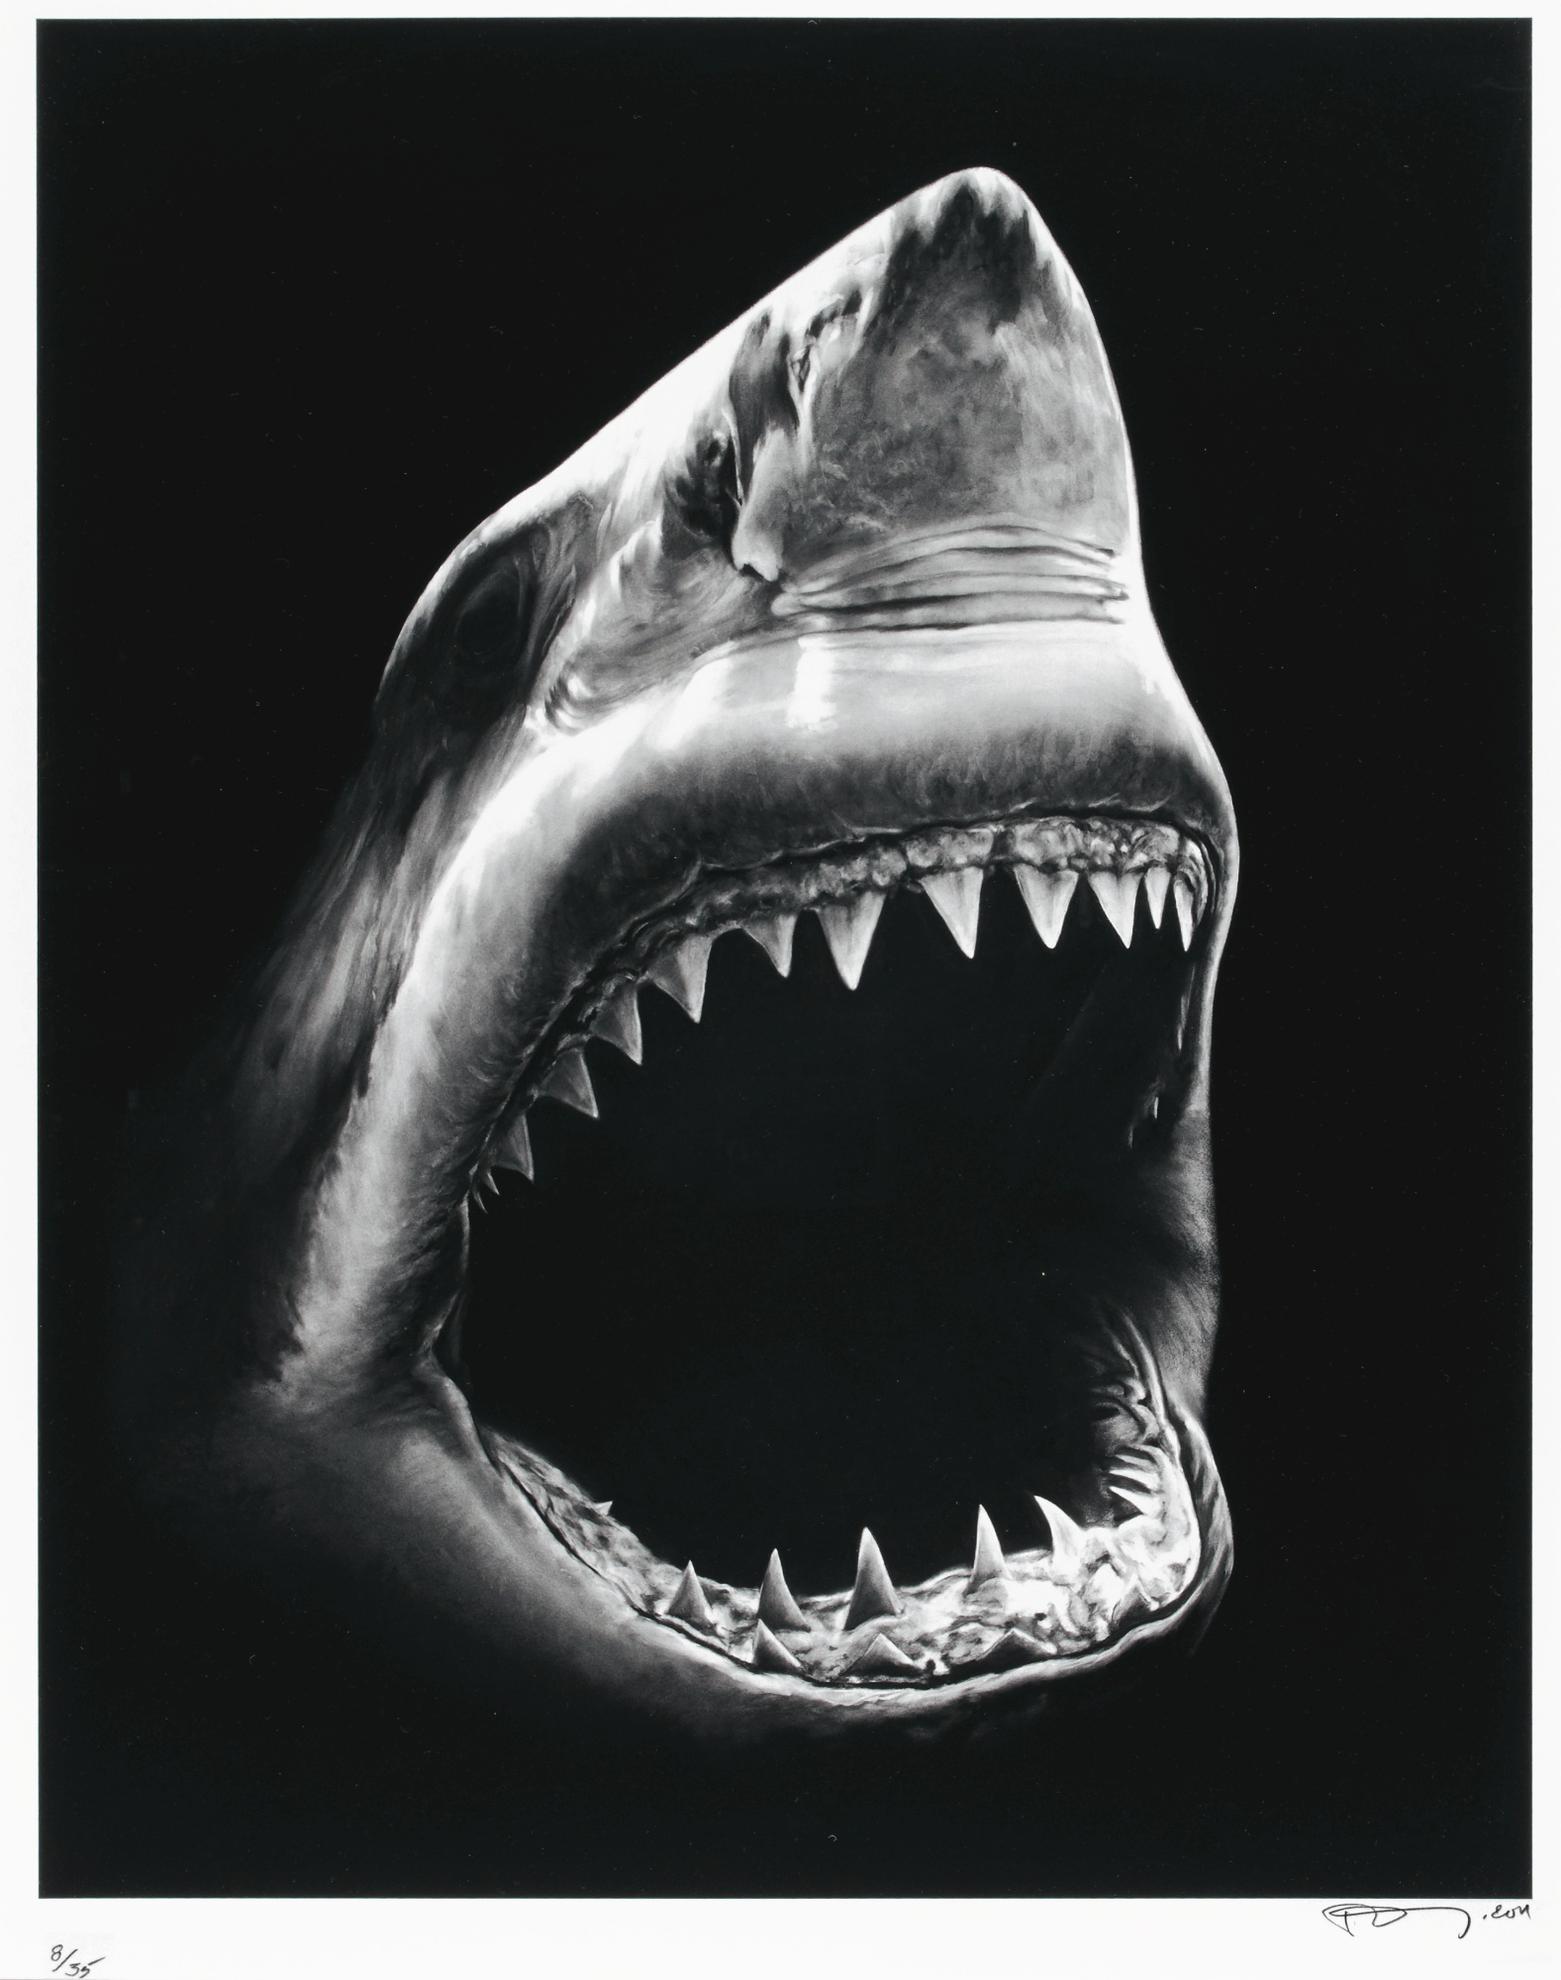 Robert Longo-Russian Bomb / Semipalatinsk; Spanish Blood / Lions Gate; Untitled (Shark 5); And Untitled (Ulysses)-2012